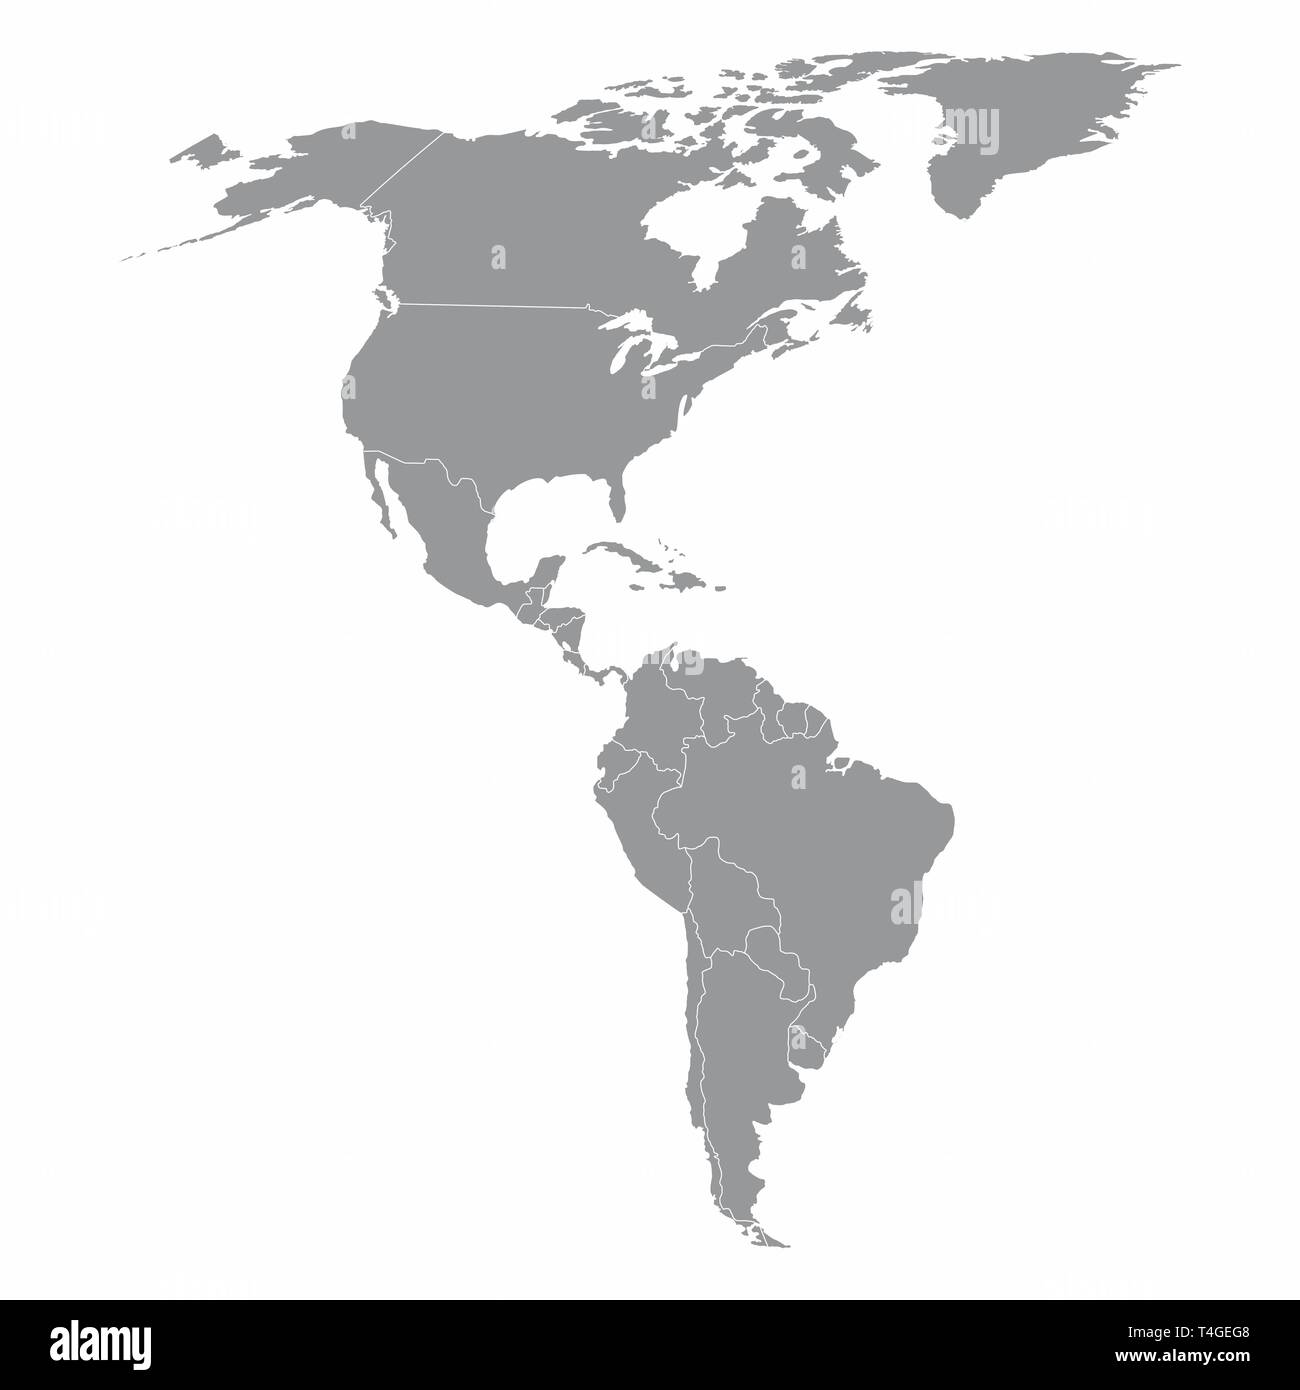 Südamerika Karte Ohne Beschriftung.Südamerika Landkarte Stockfotos Südamerika Landkarte Bilder Alamy